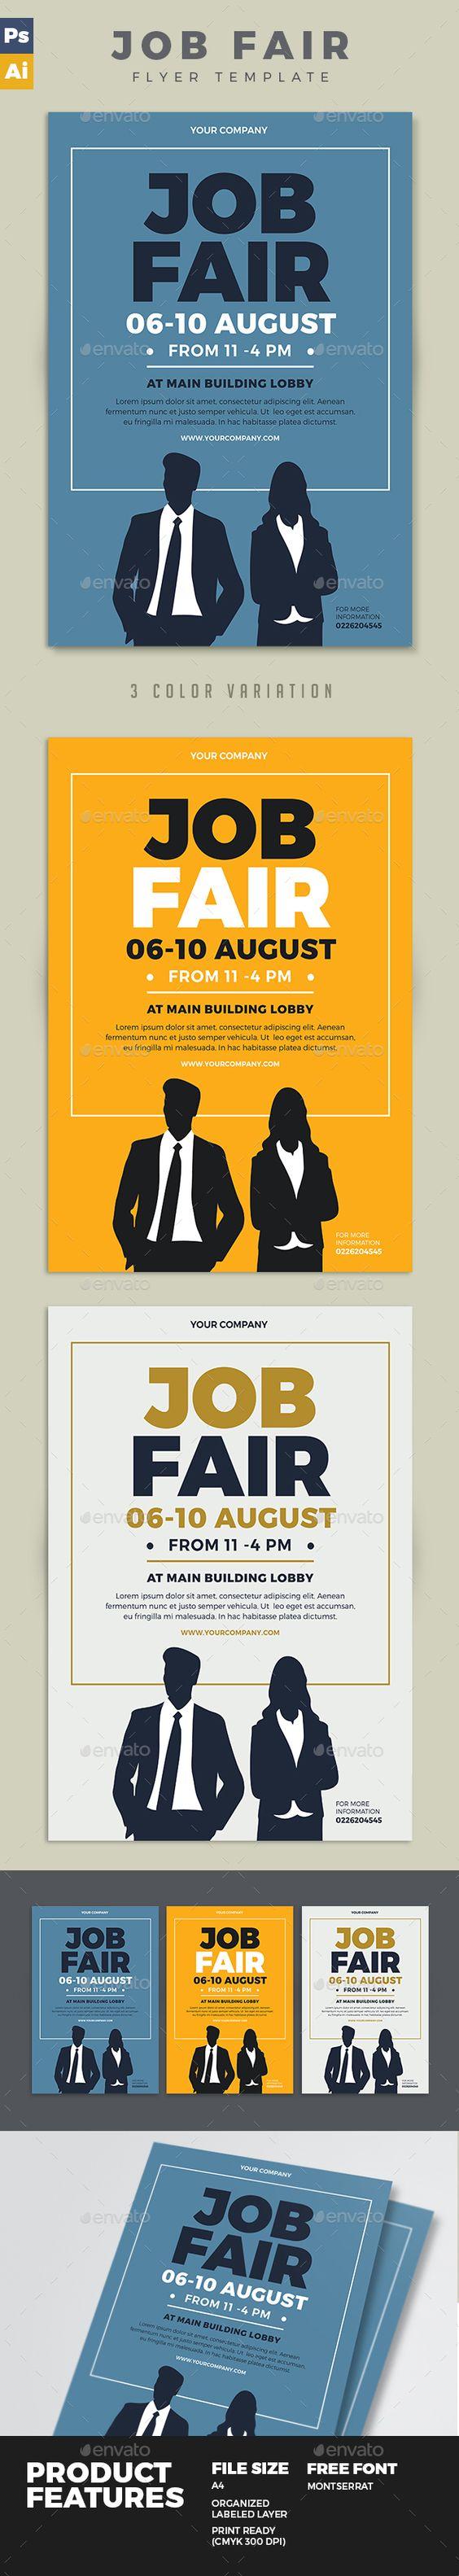 job fair brochure template - pinterest the world s catalog of ideas